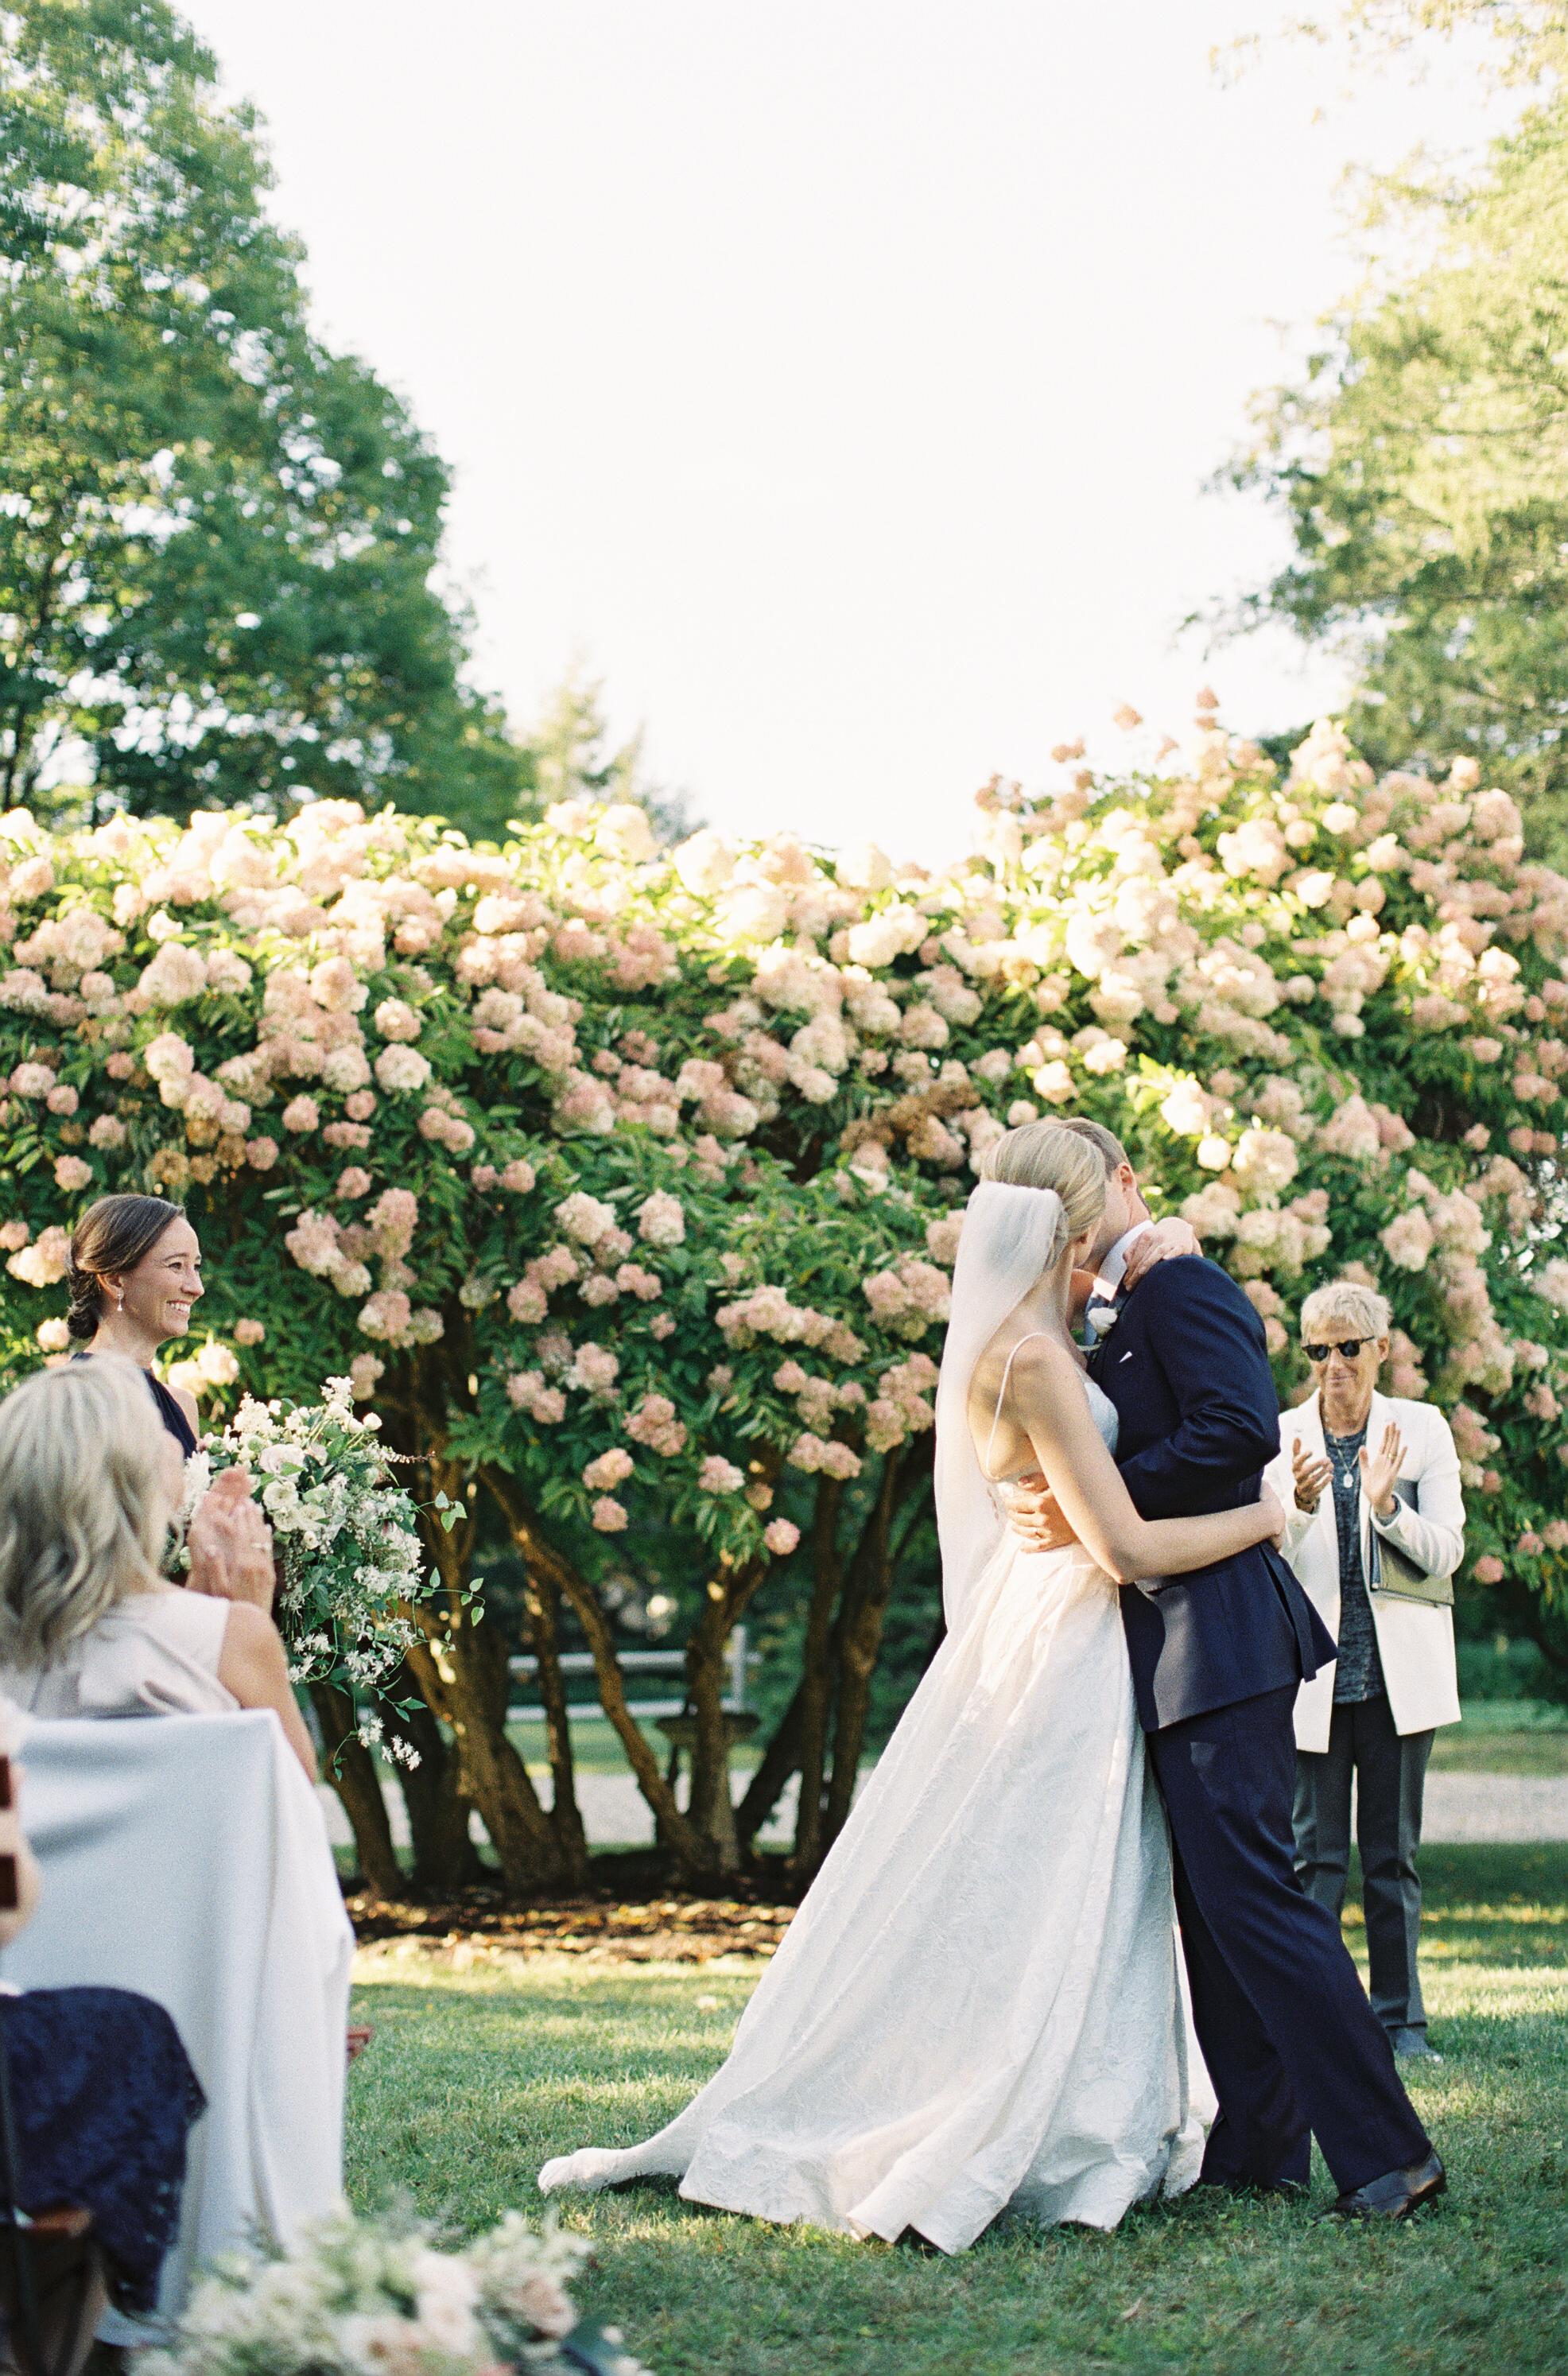 Redding-Connecticut-Wedding-36.jpg